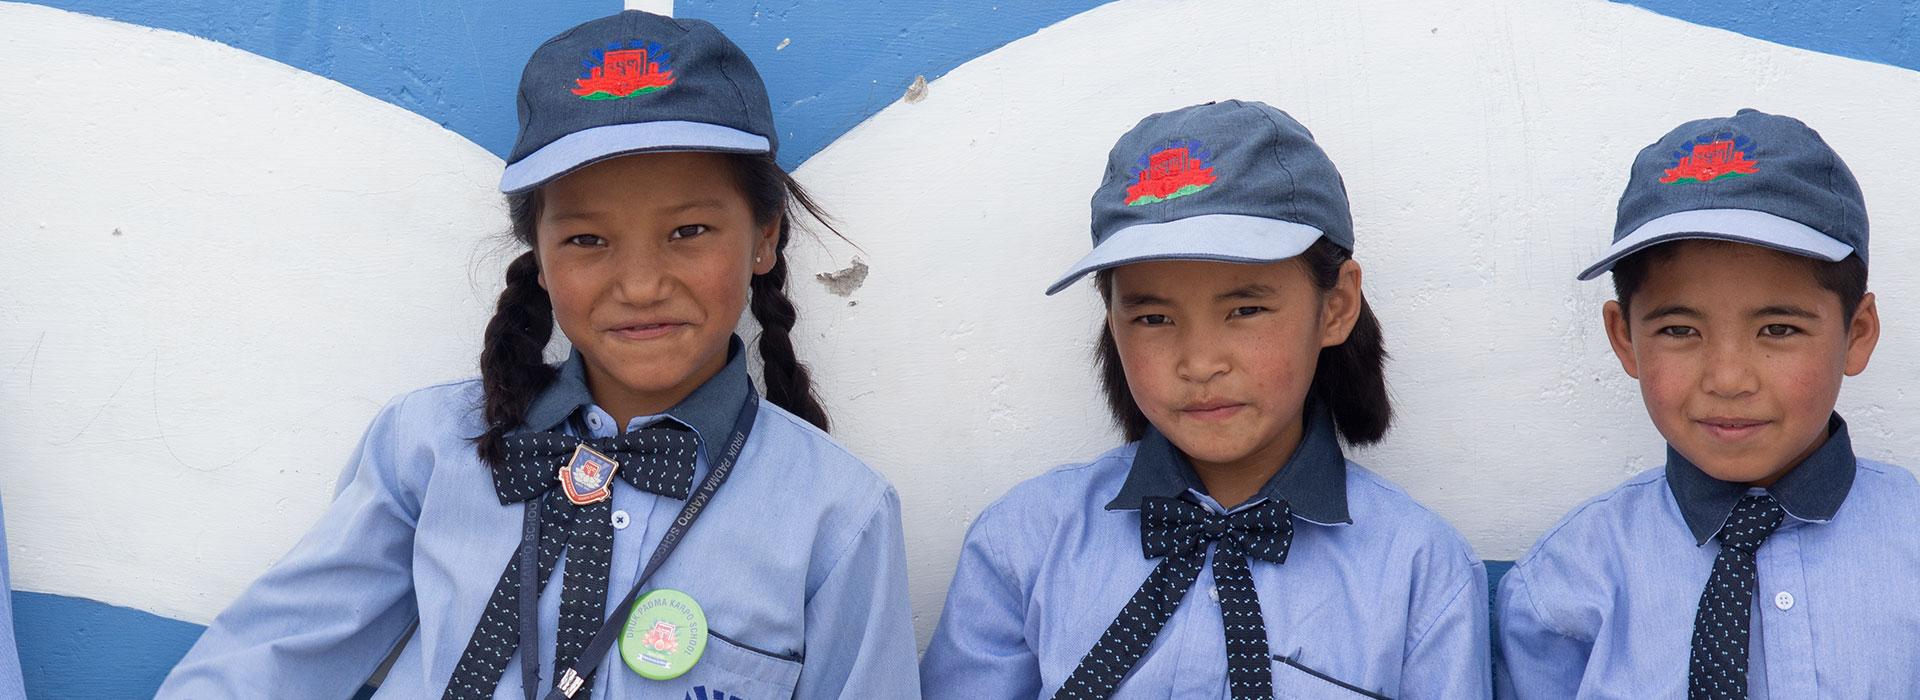 Himalayan Children